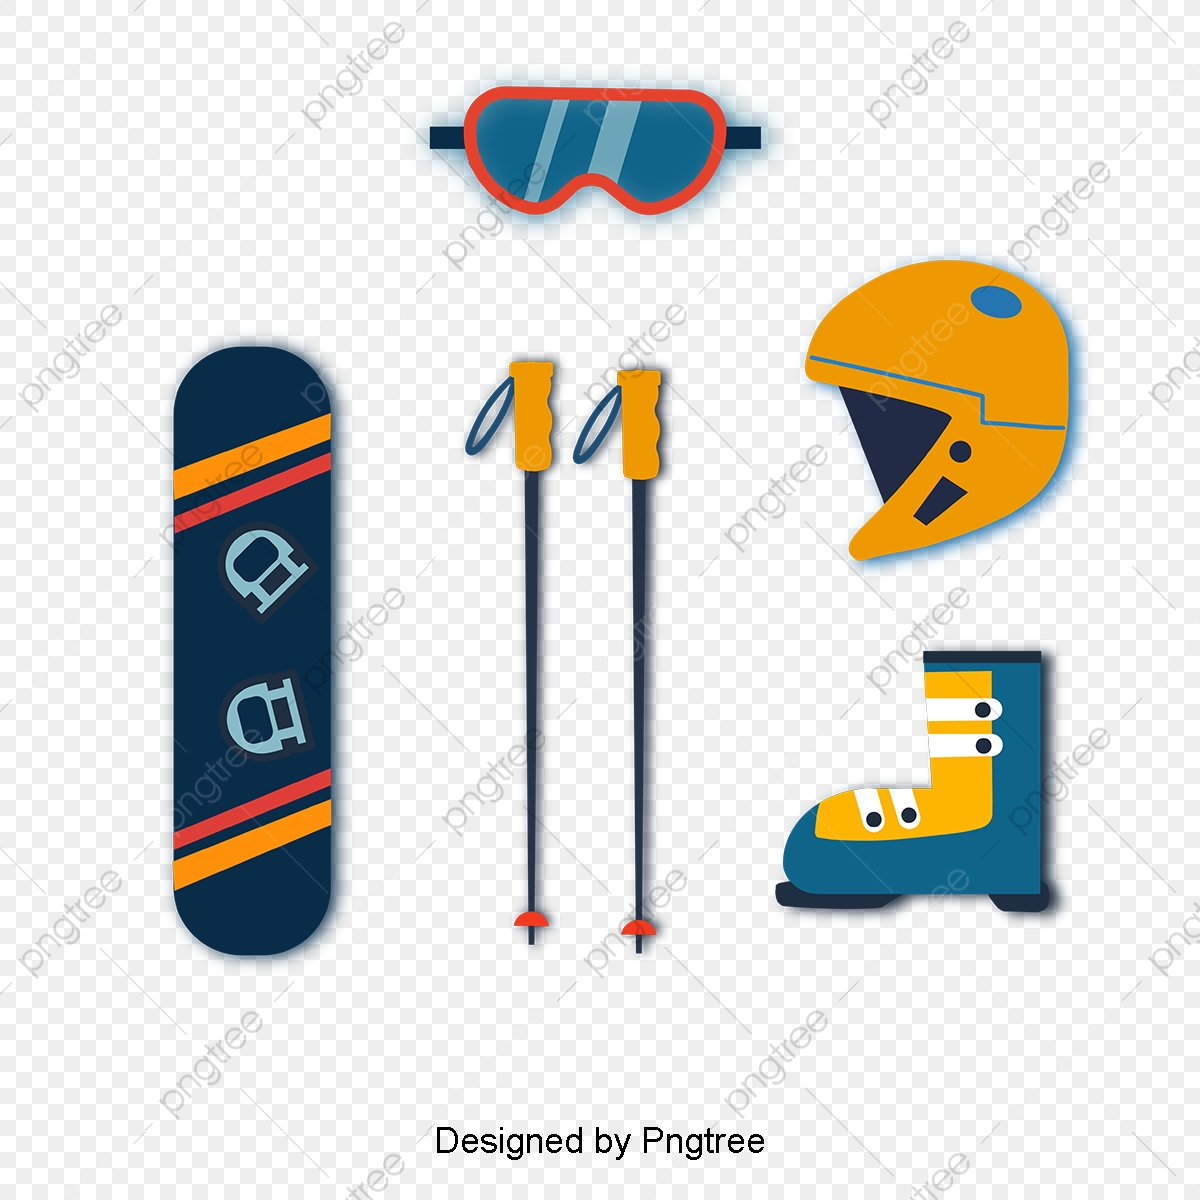 Cartoon Hand Drawn Ski Set, Glasses, Ski Sticks, Helmets PNG